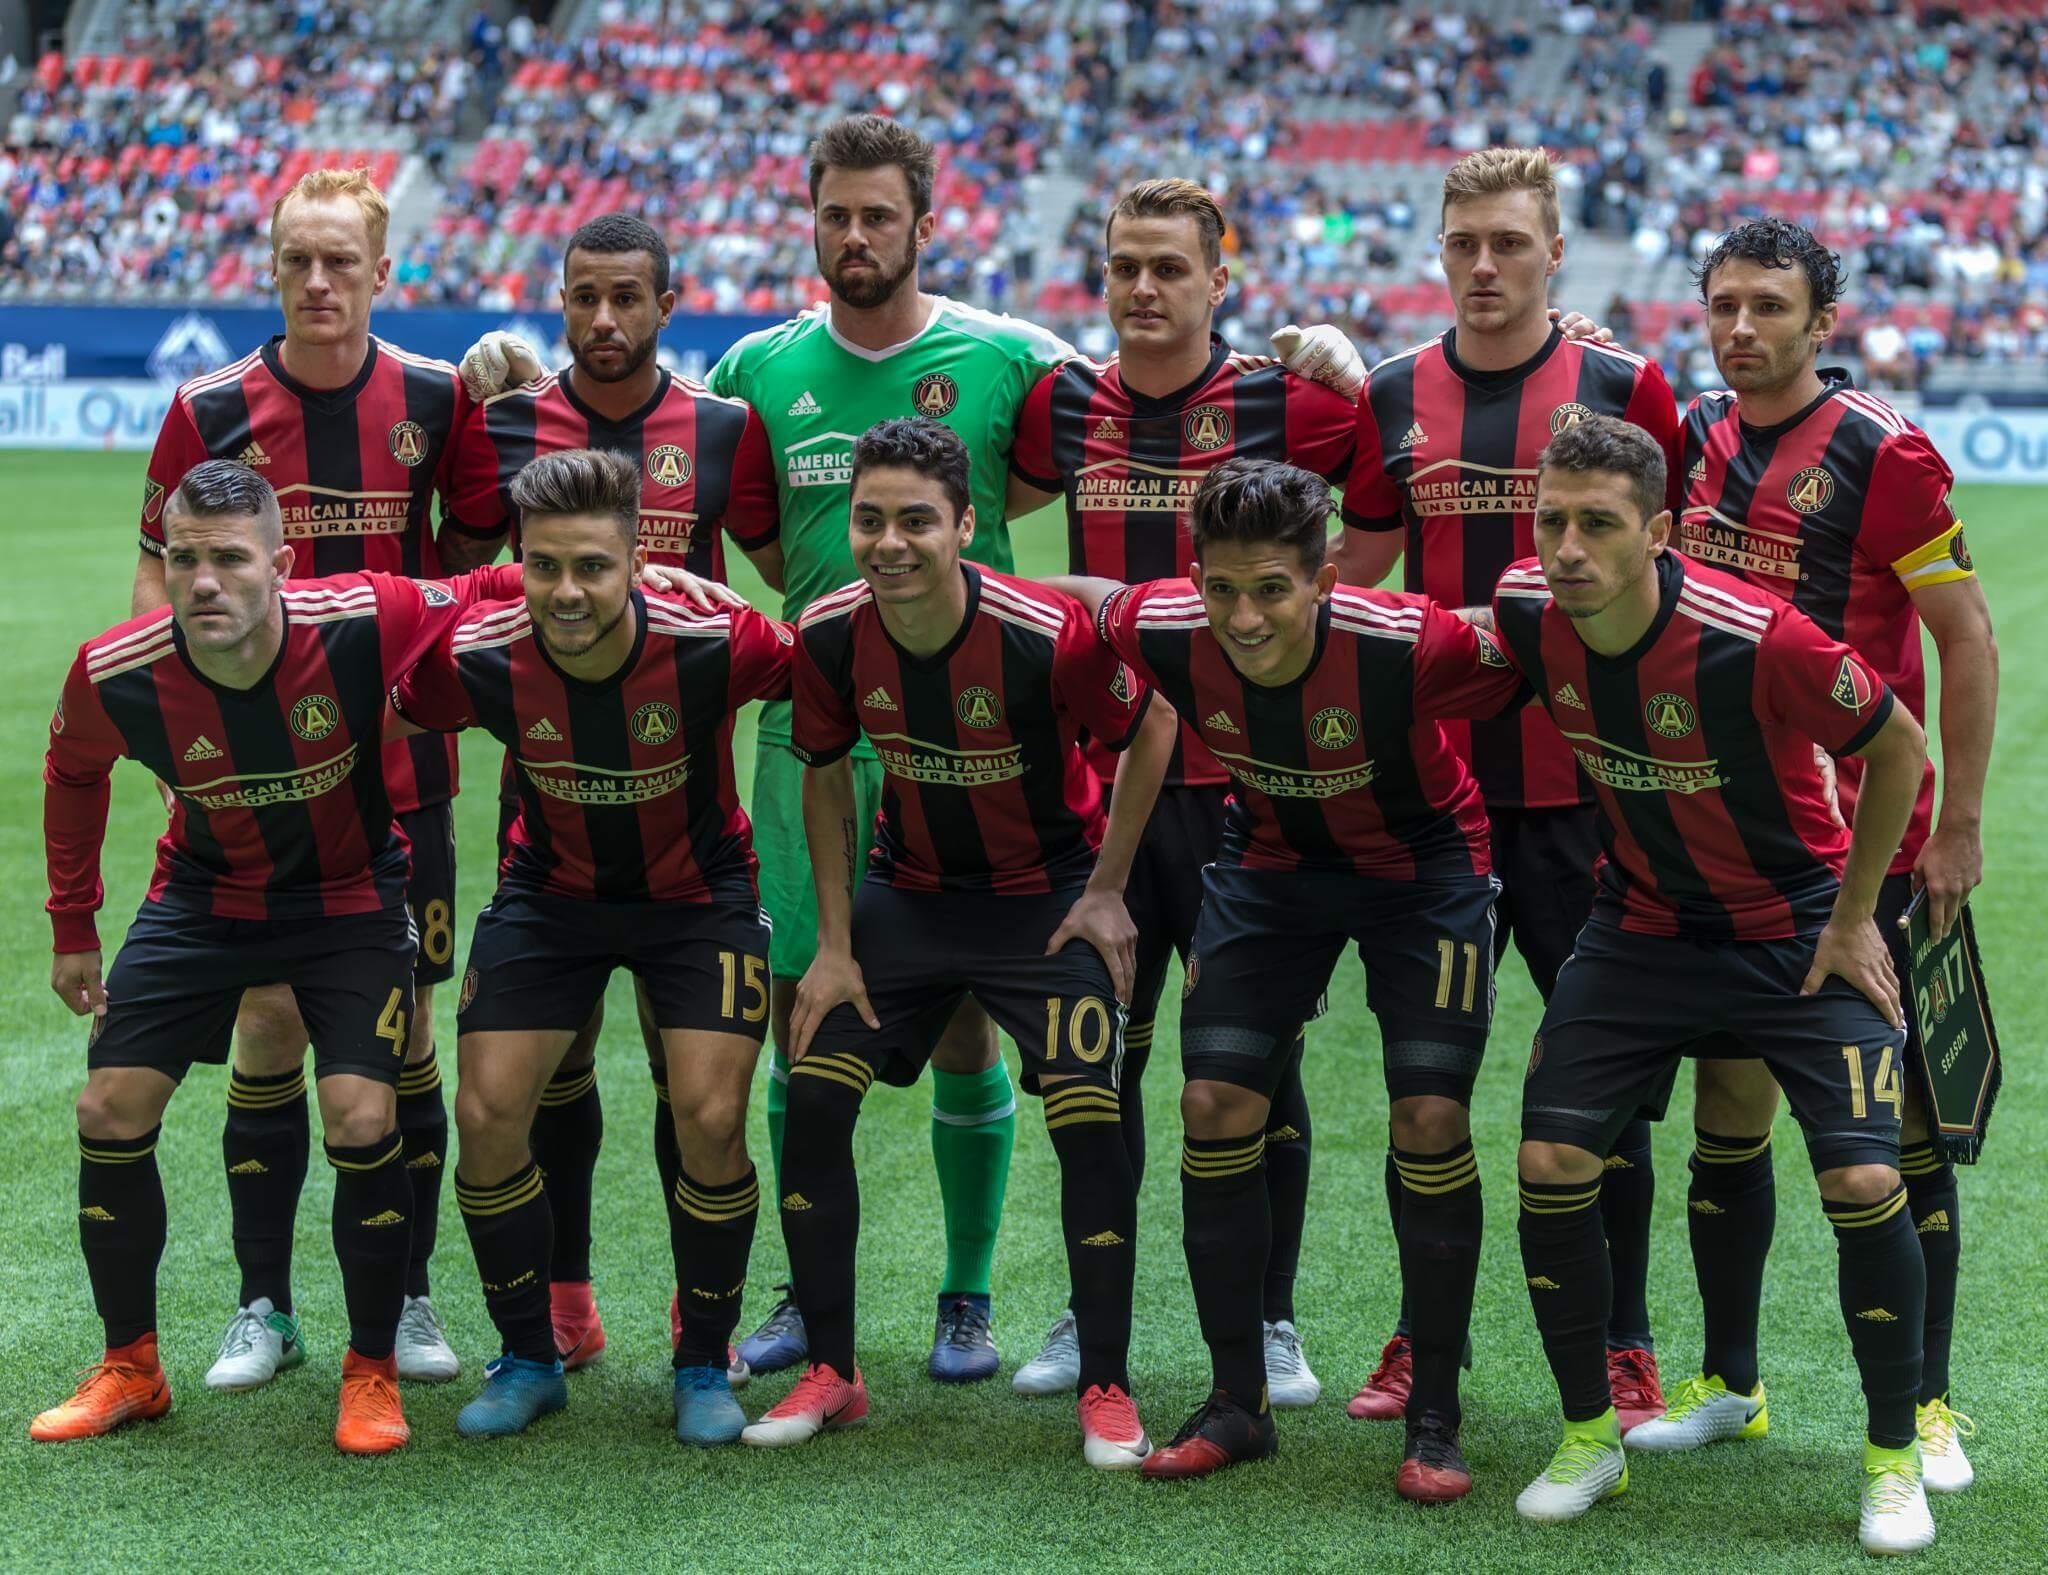 Atlanta United FC soccer players